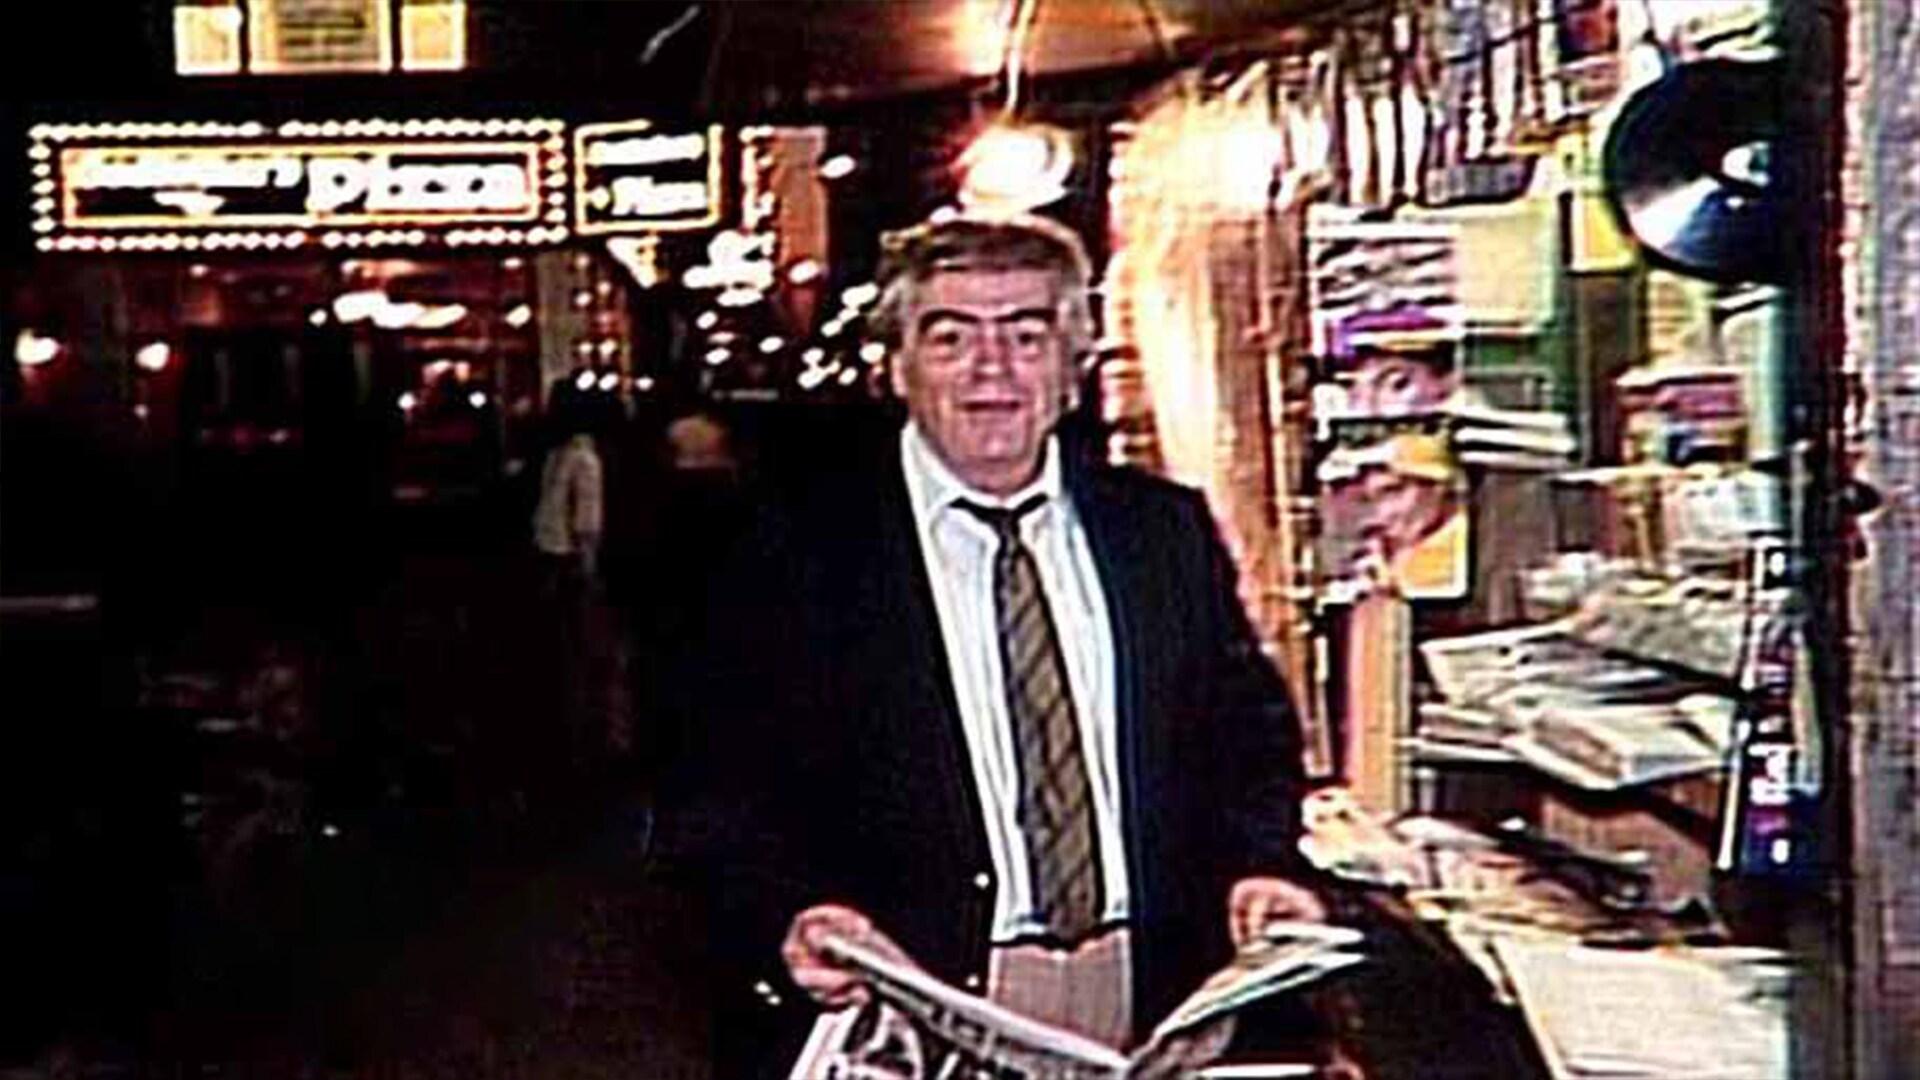 Jimmy Breslin: May 17, 1986